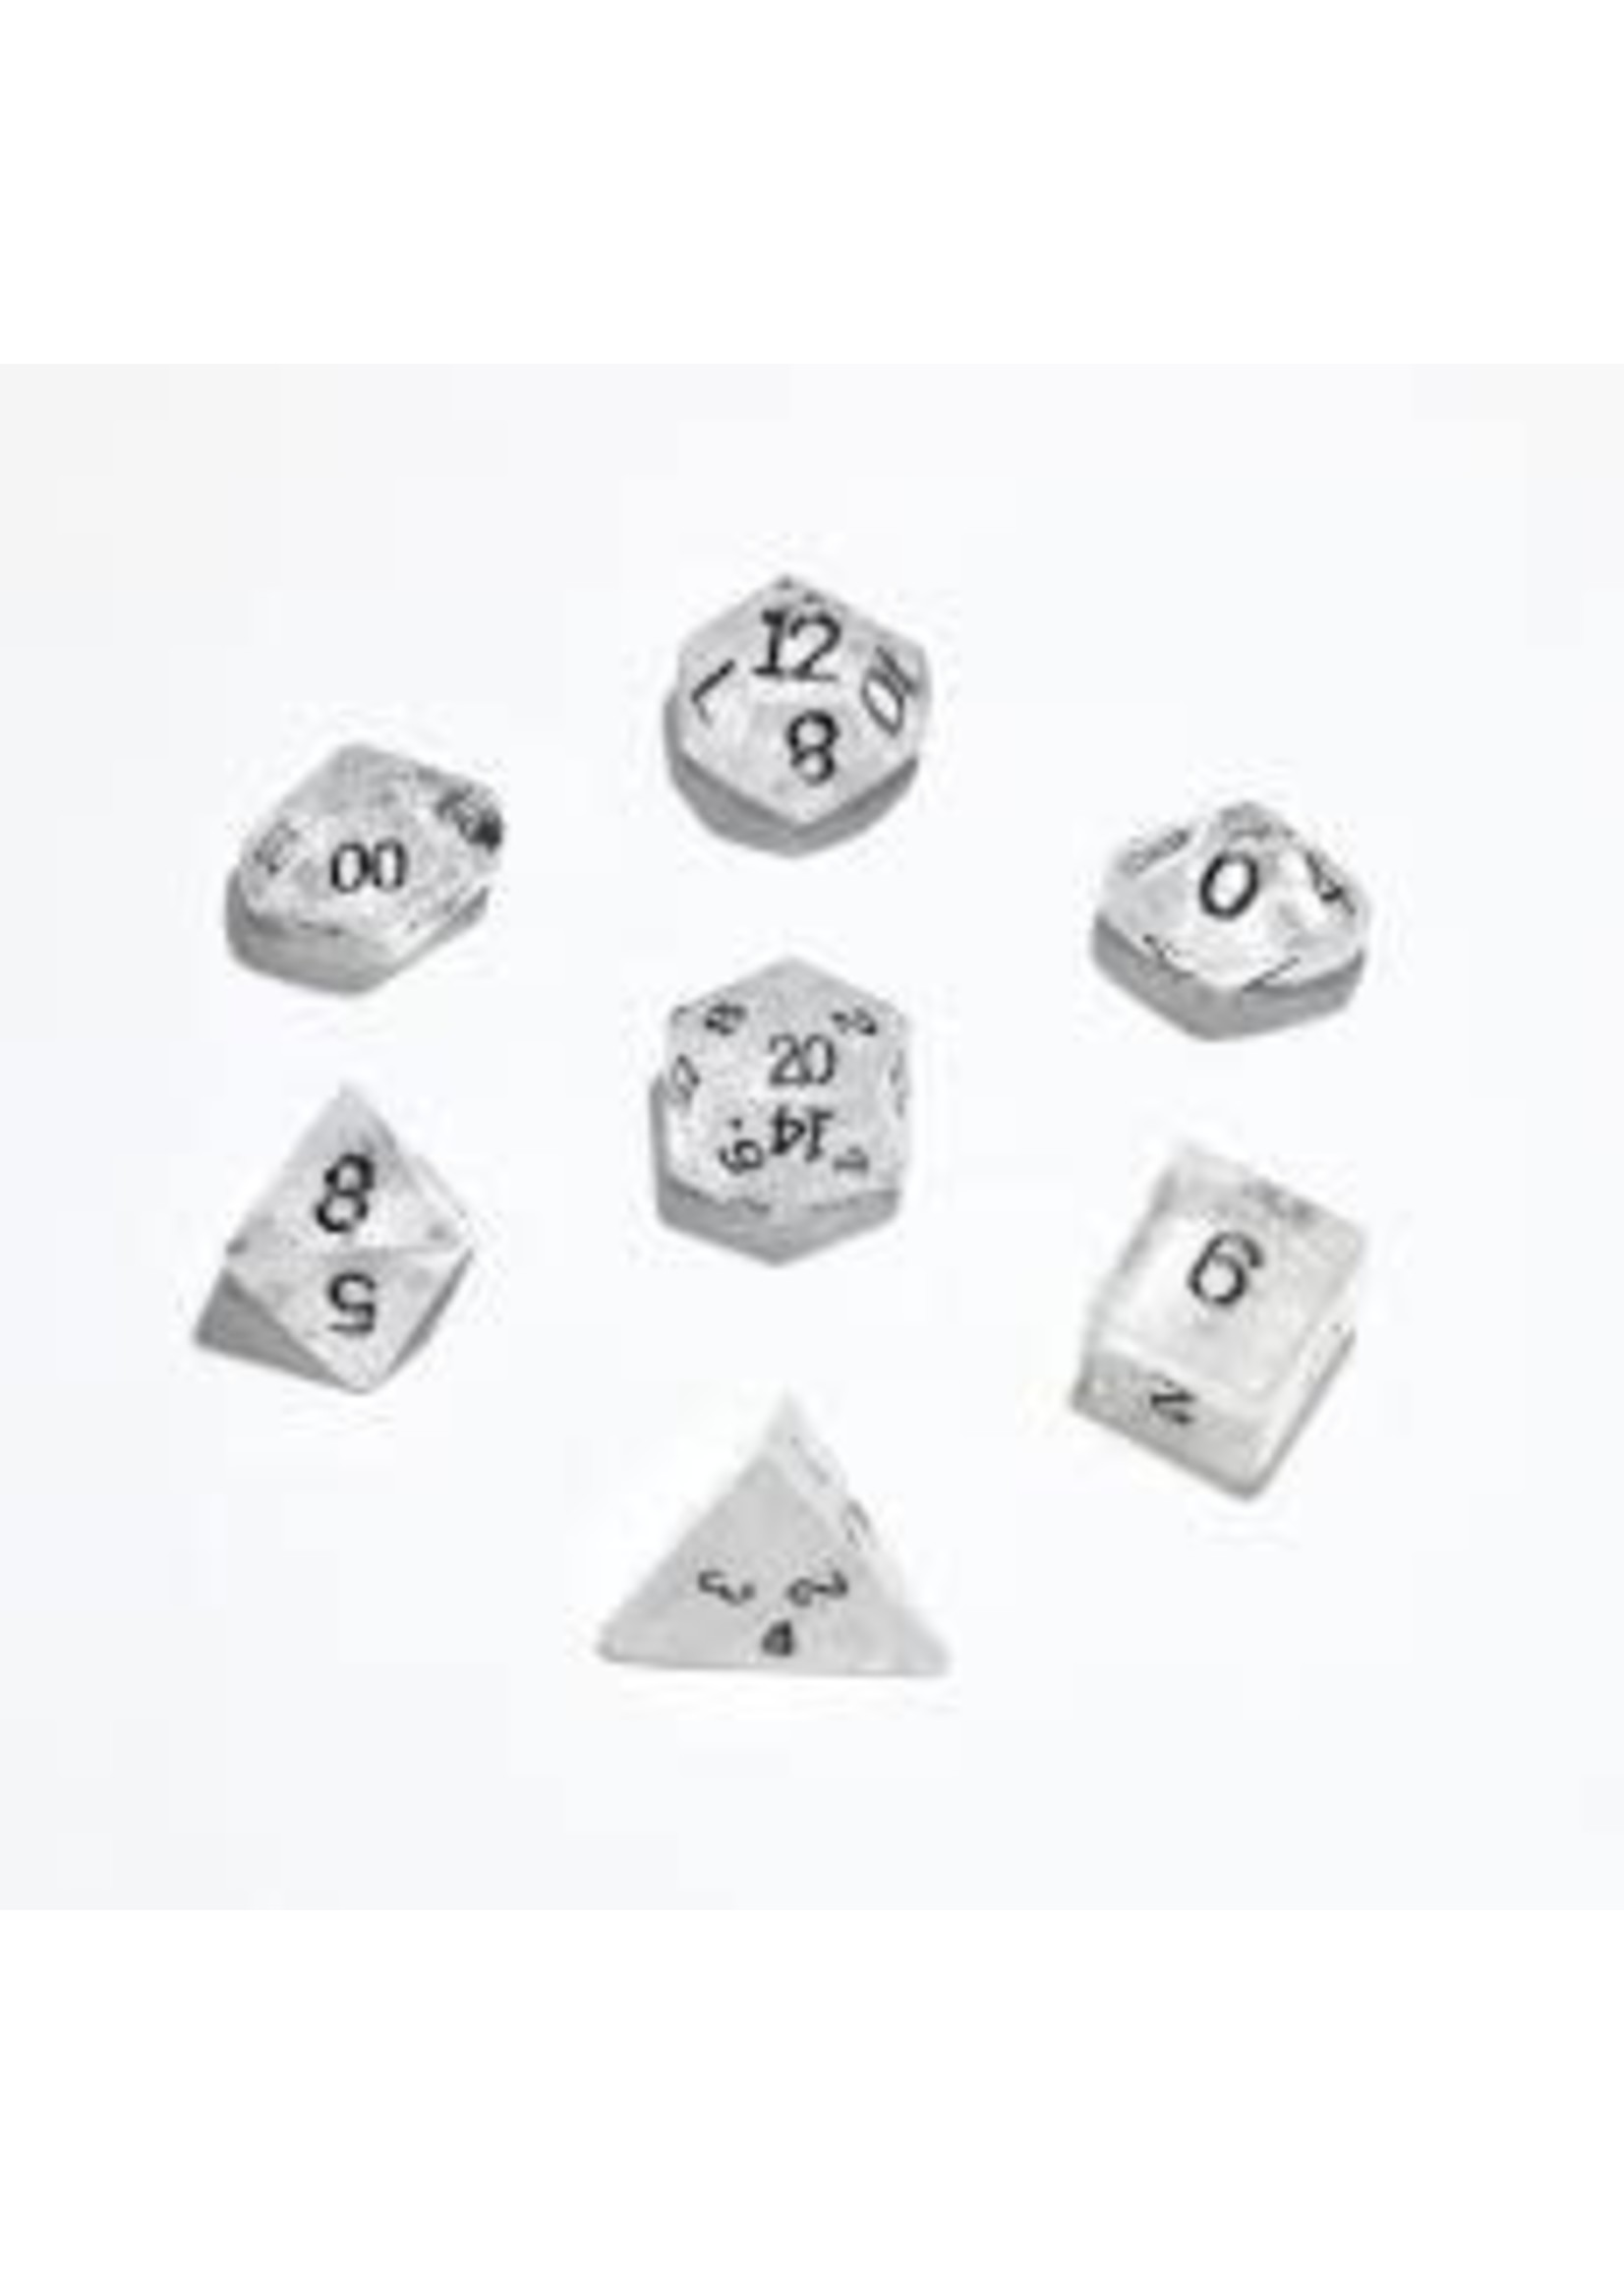 Crystal Caste 16mm Clear Quartz 7 set (black numbers)